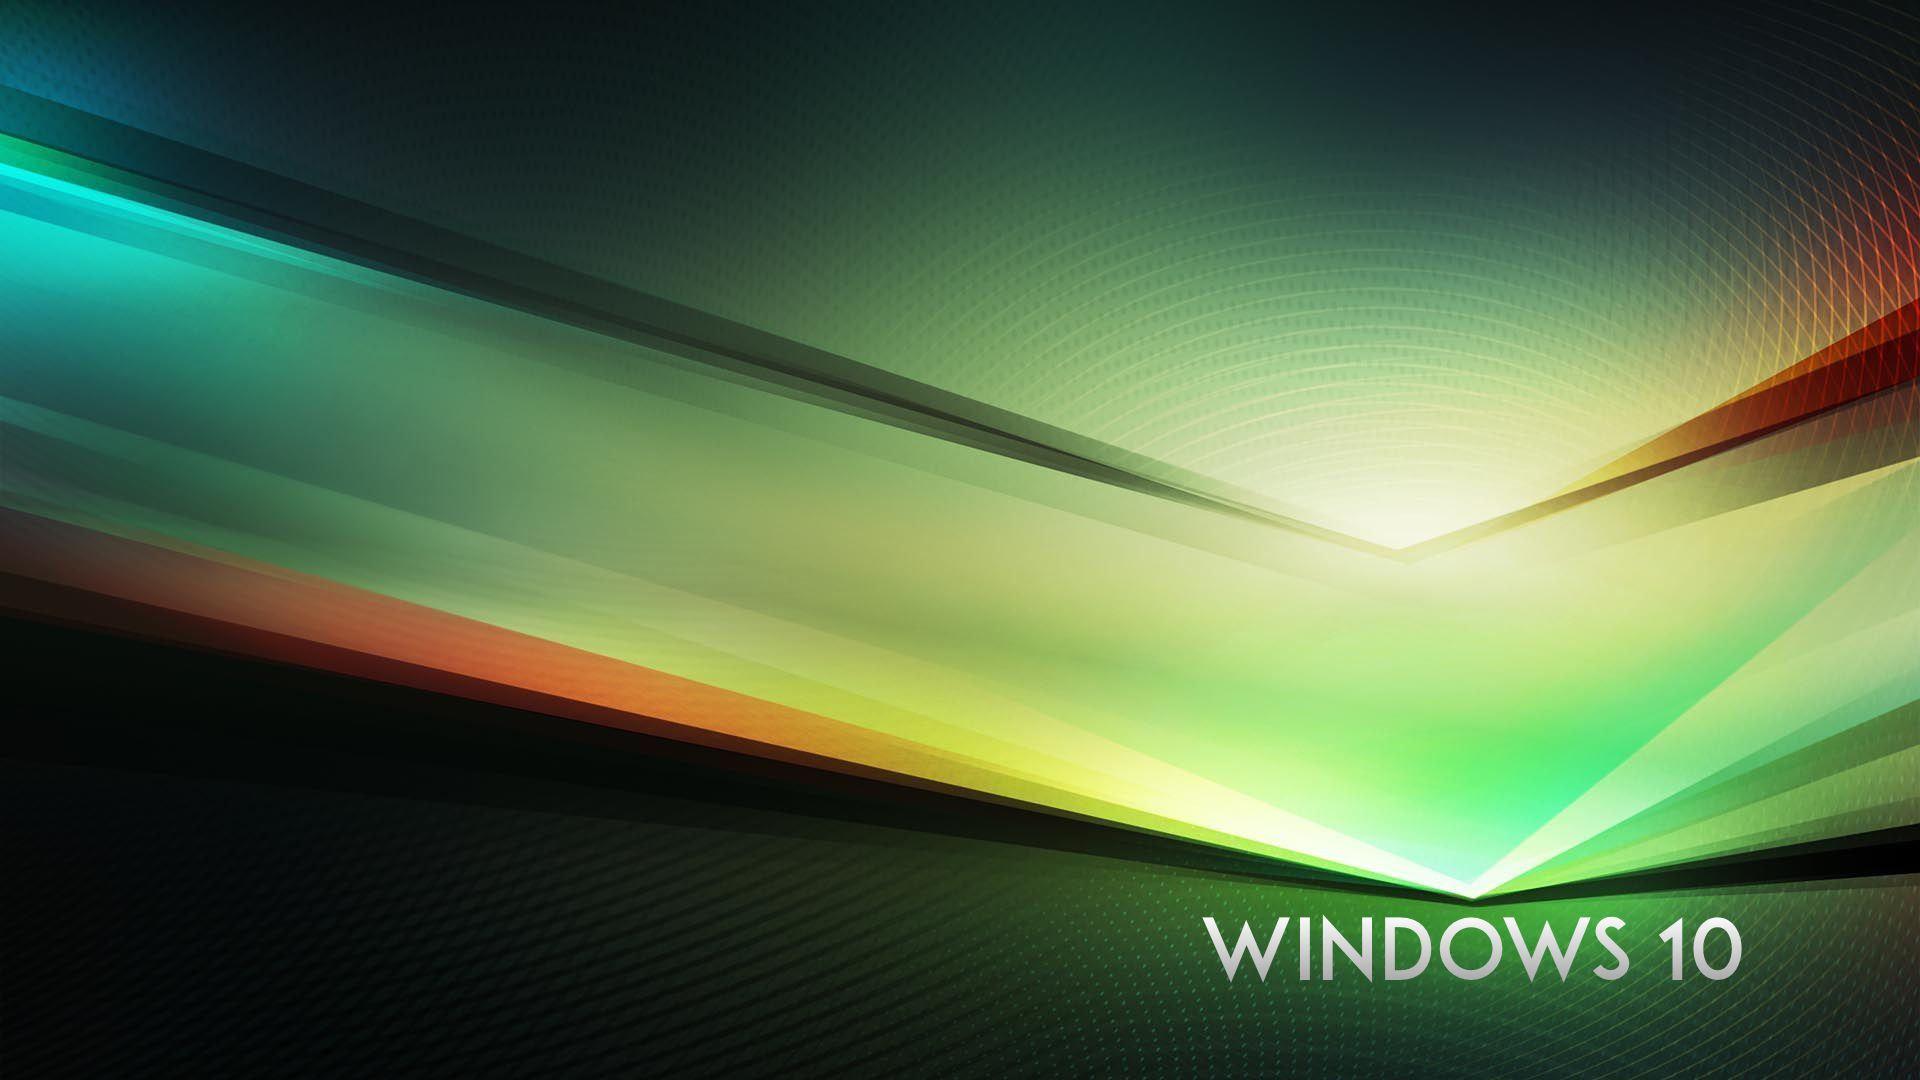 Windows 10 Wallpaper For Pc - HD Wallpaper